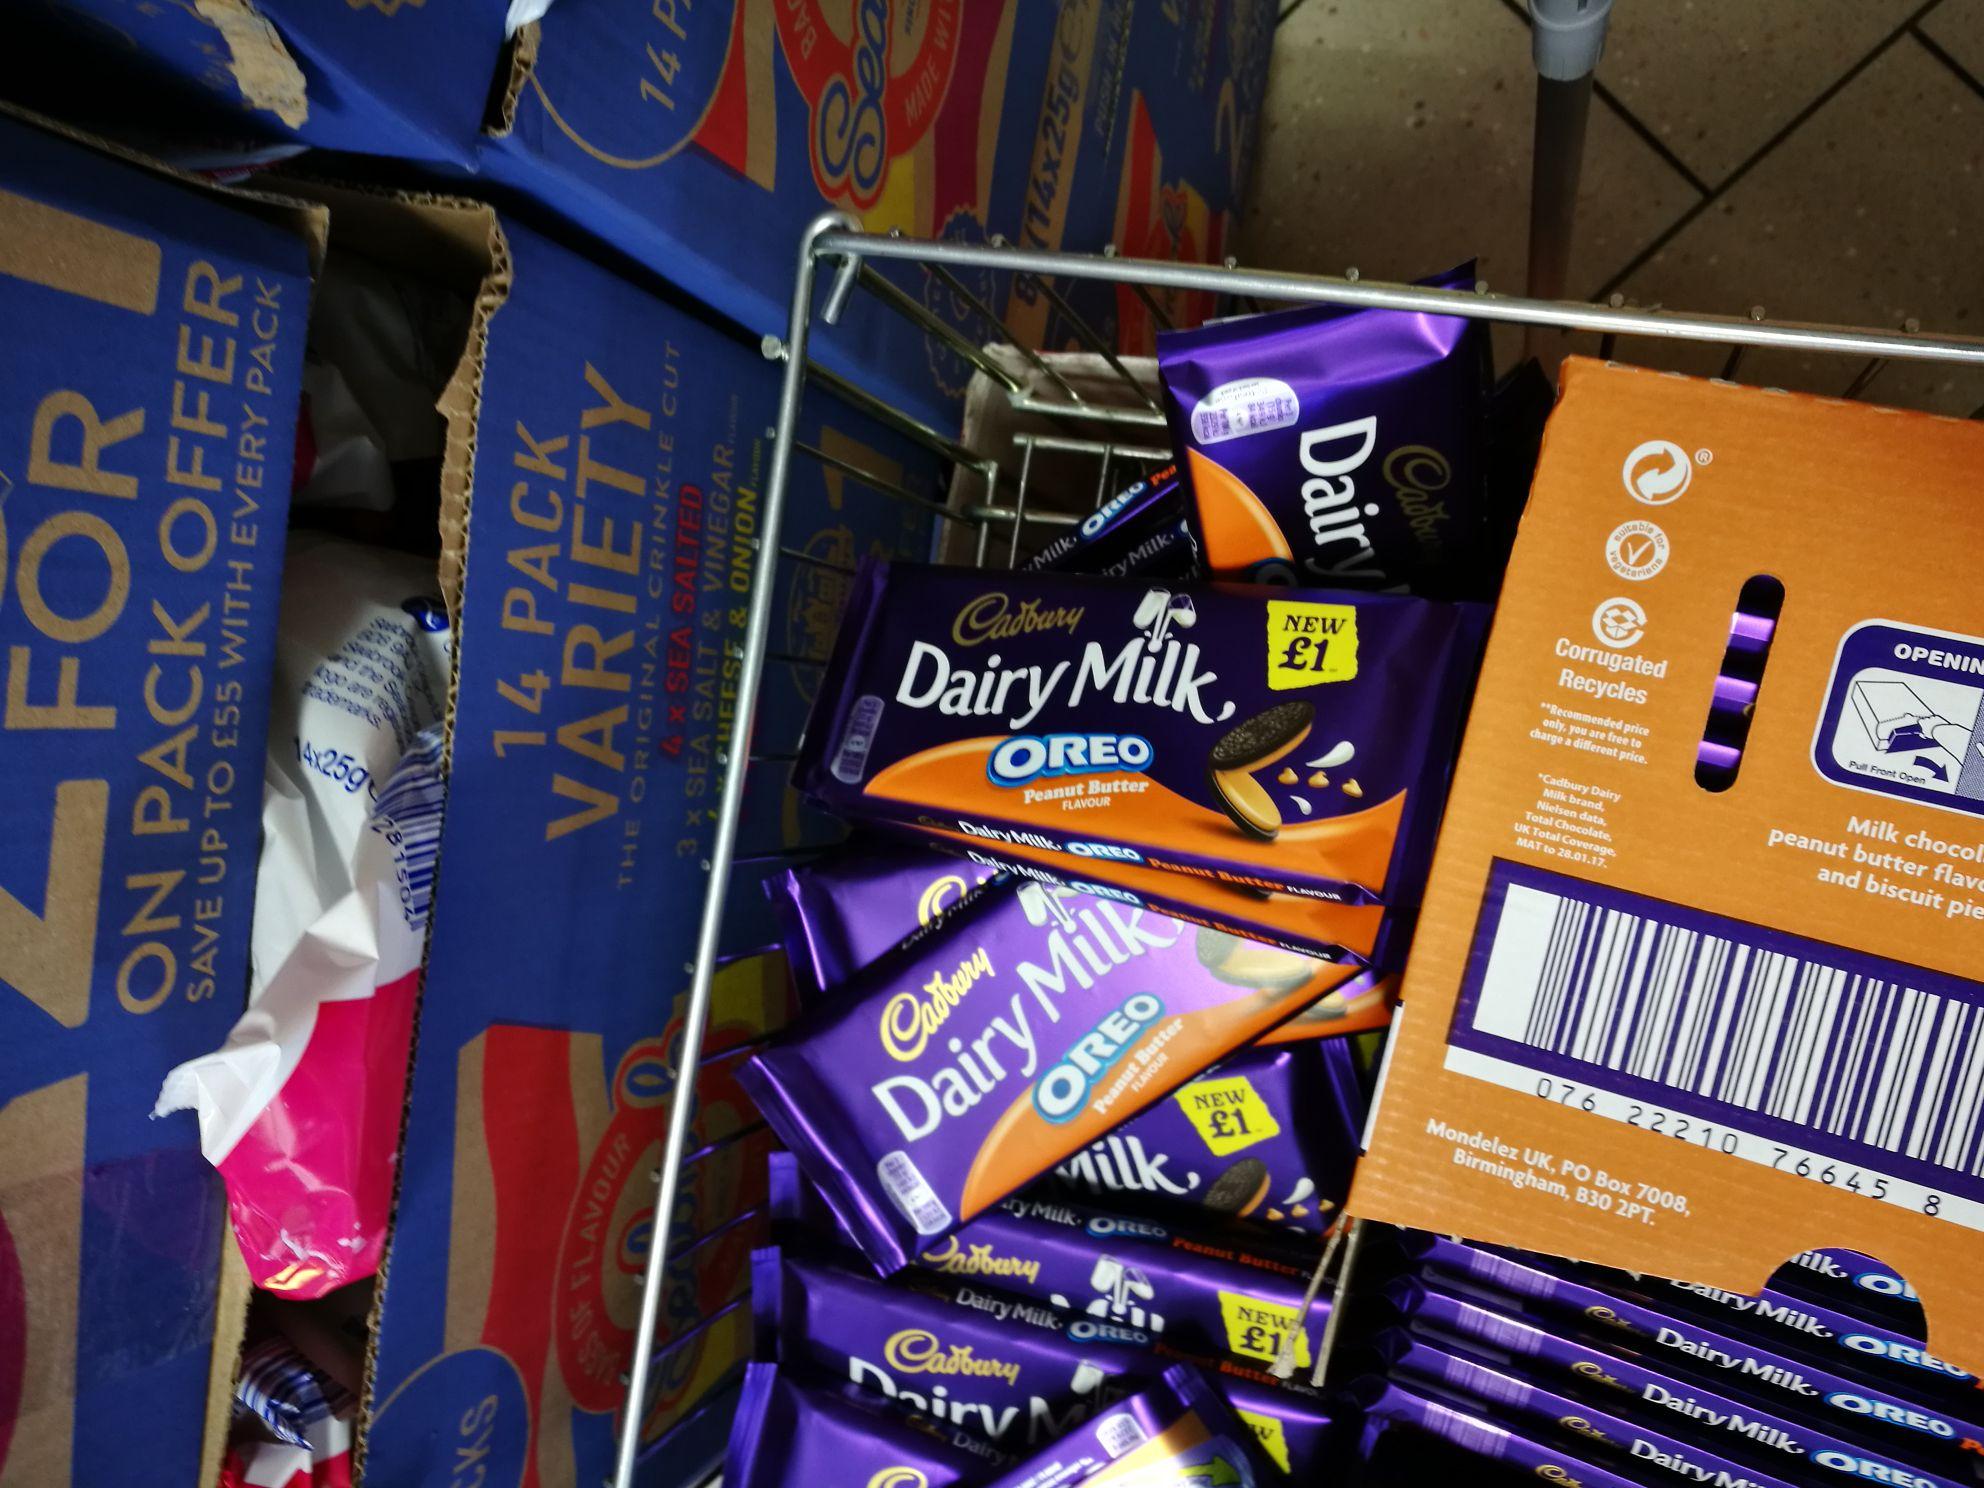 Cad dairy milk oreo peanut butter 39p instore @ heron foods (Oldham)